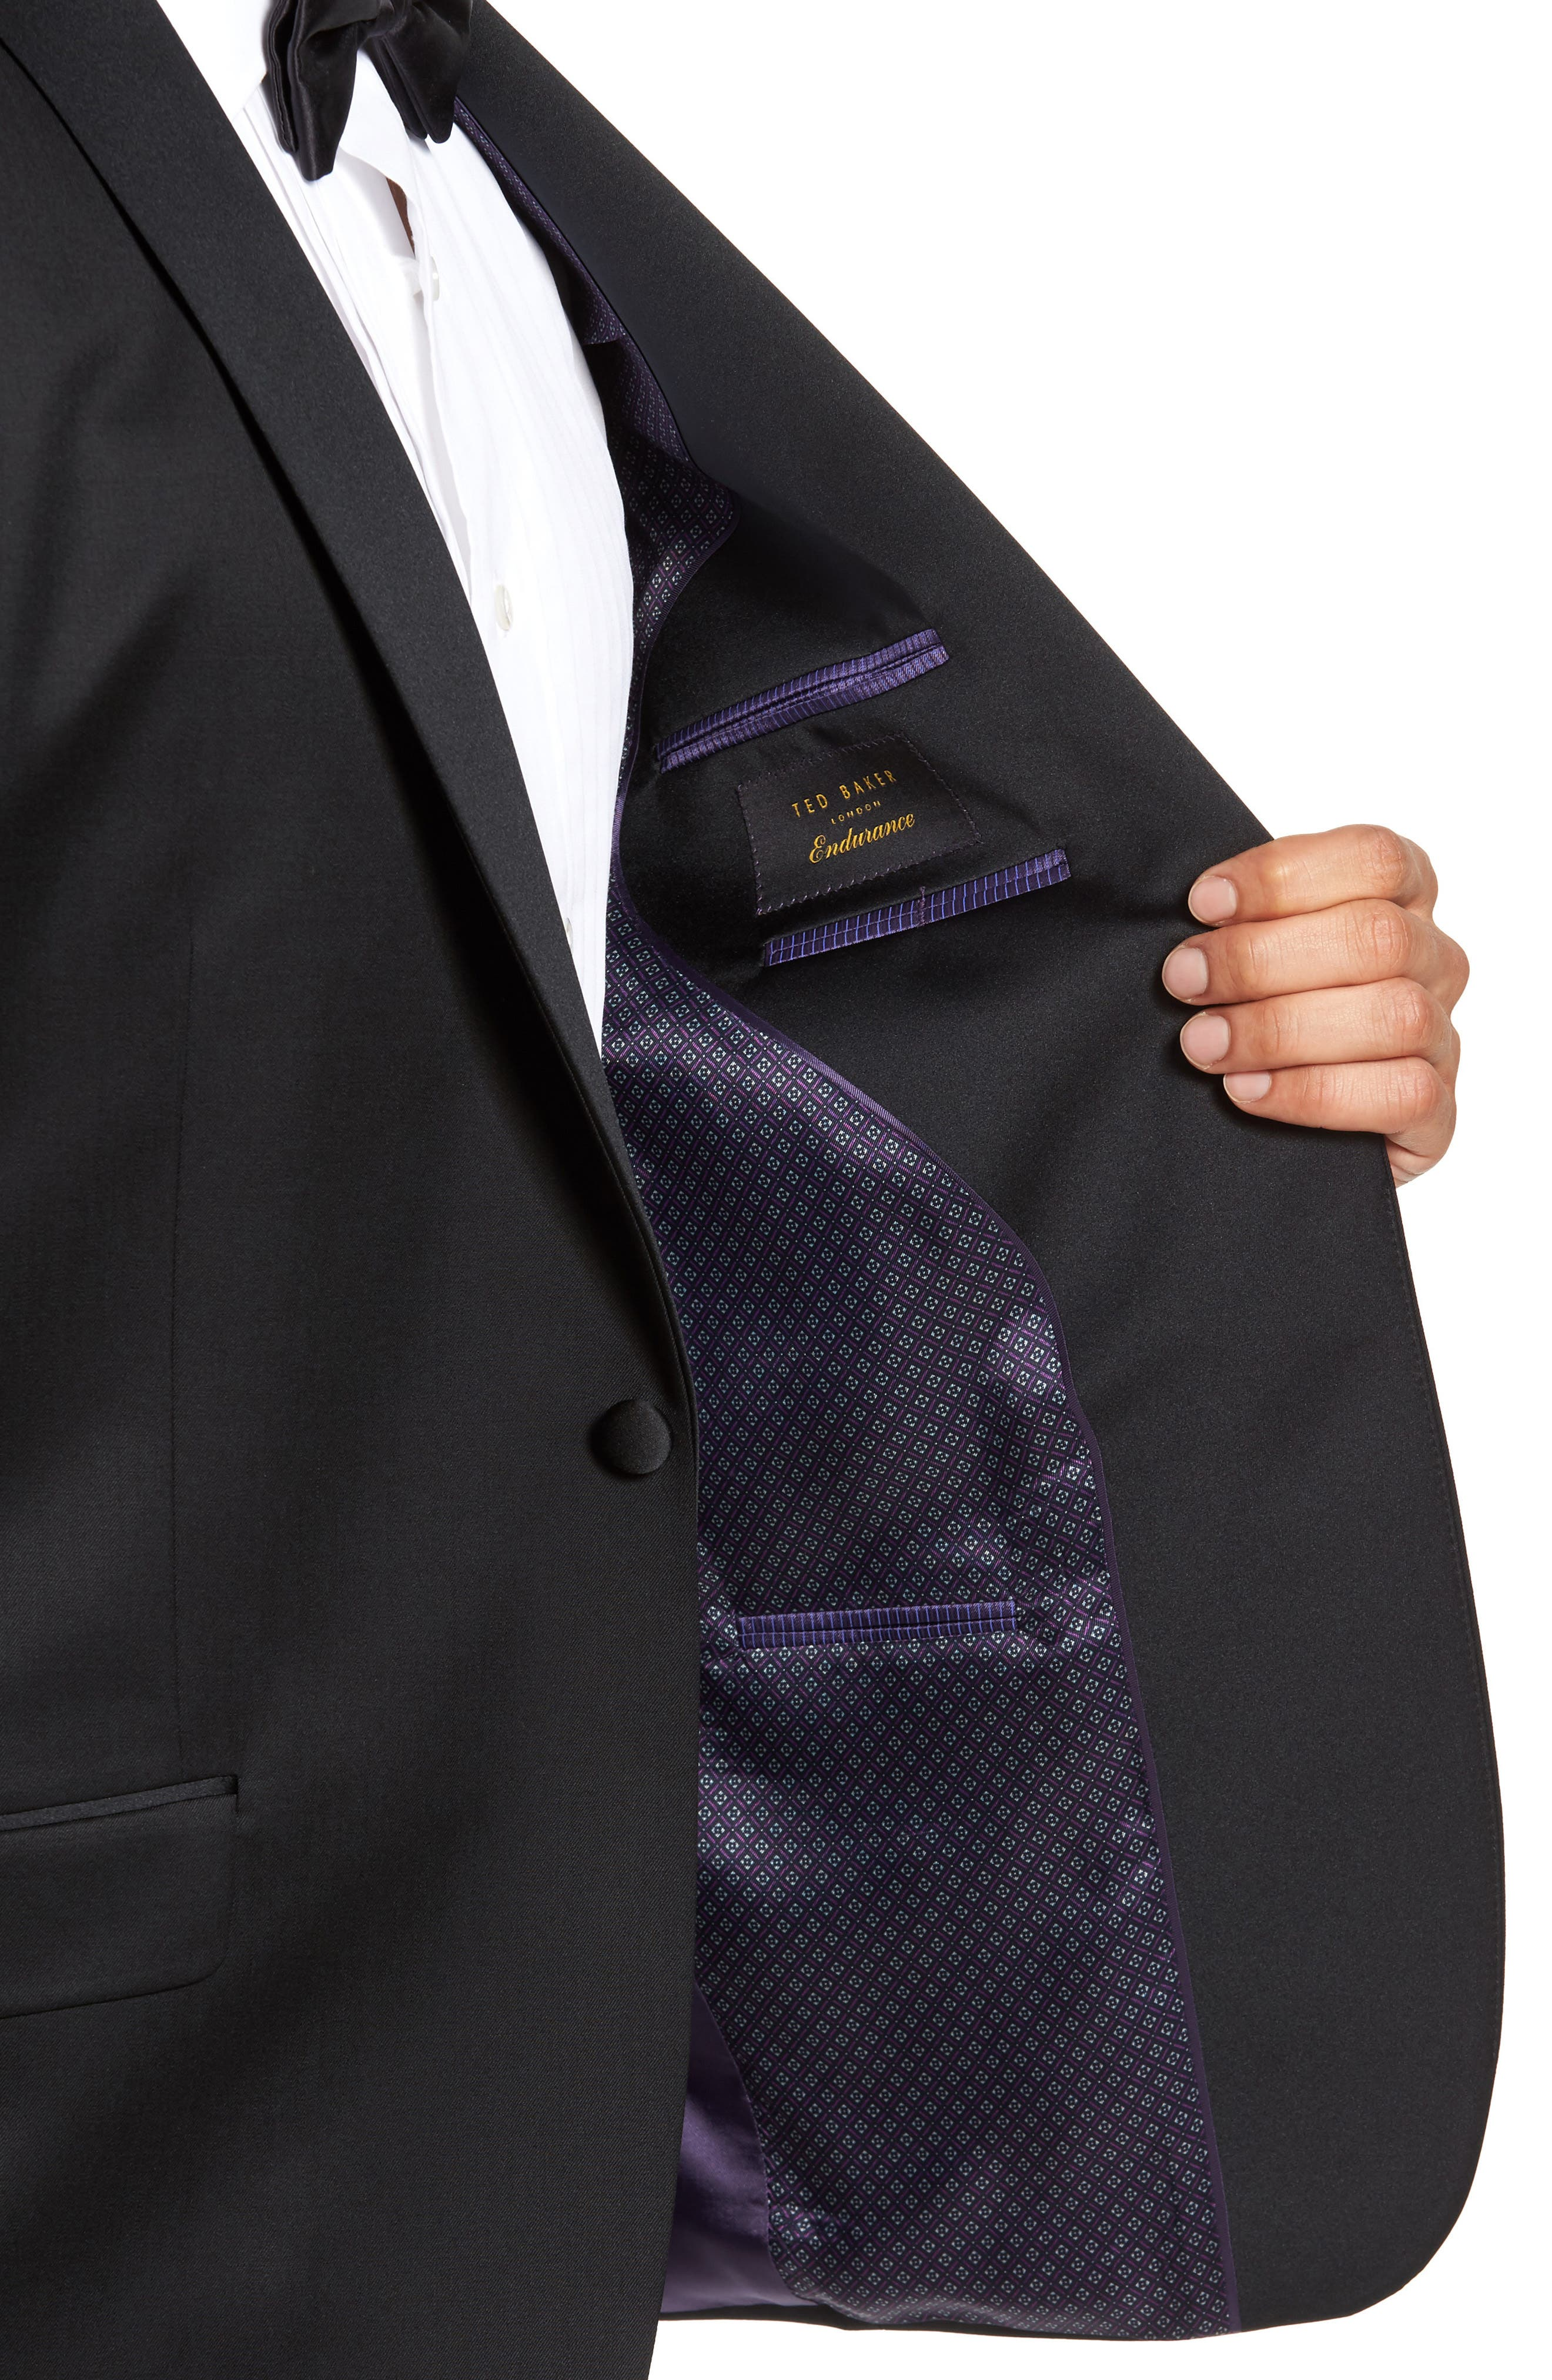 TED BAKER LONDON, Josh Trim Fit Wool & Mohair Tuxedo, Alternate thumbnail 4, color, BLACK